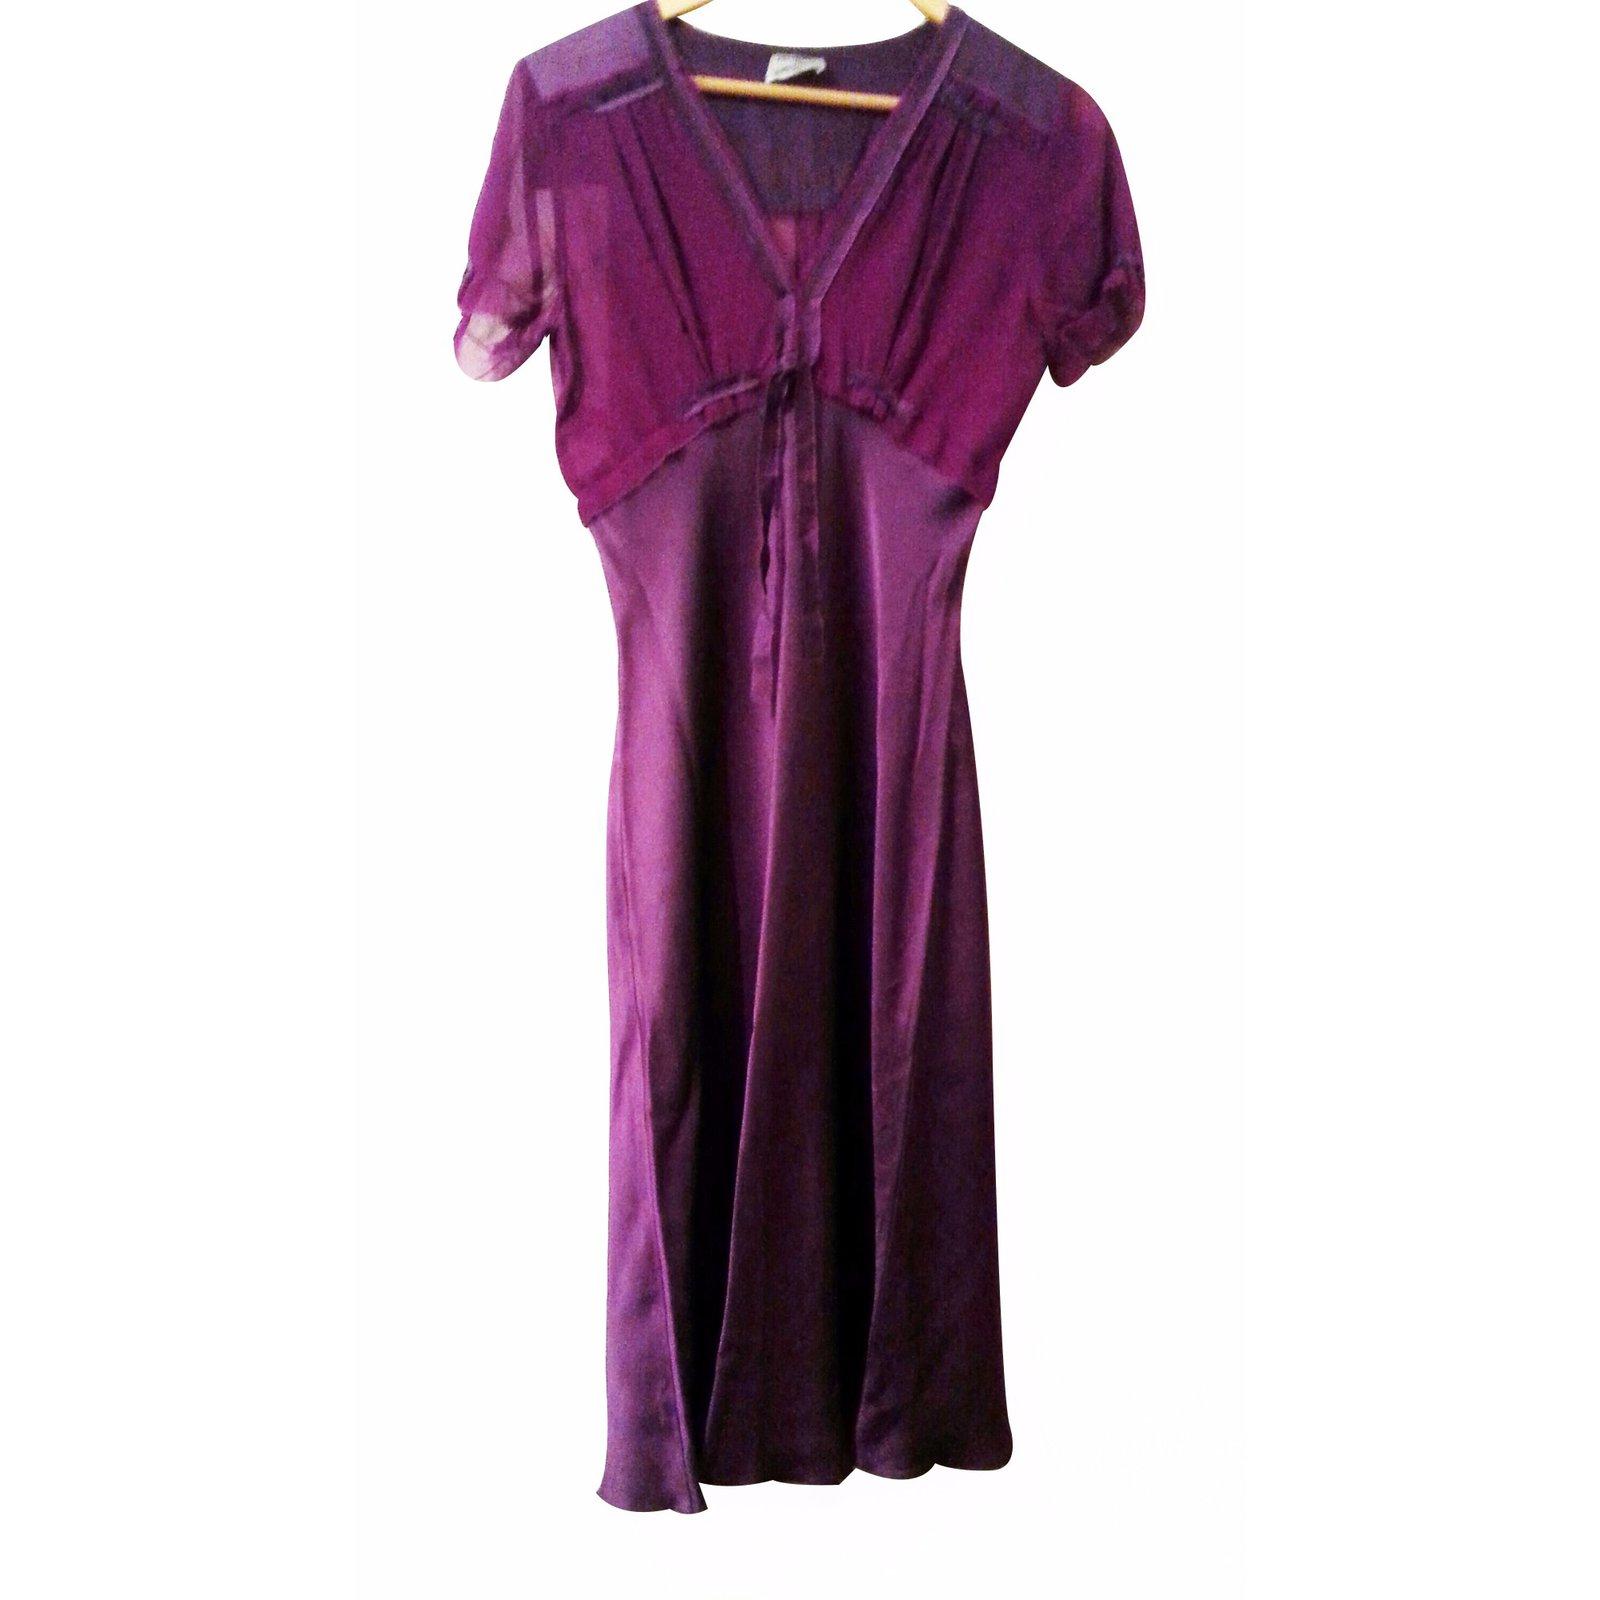 buy popular e1435 e475b Dress